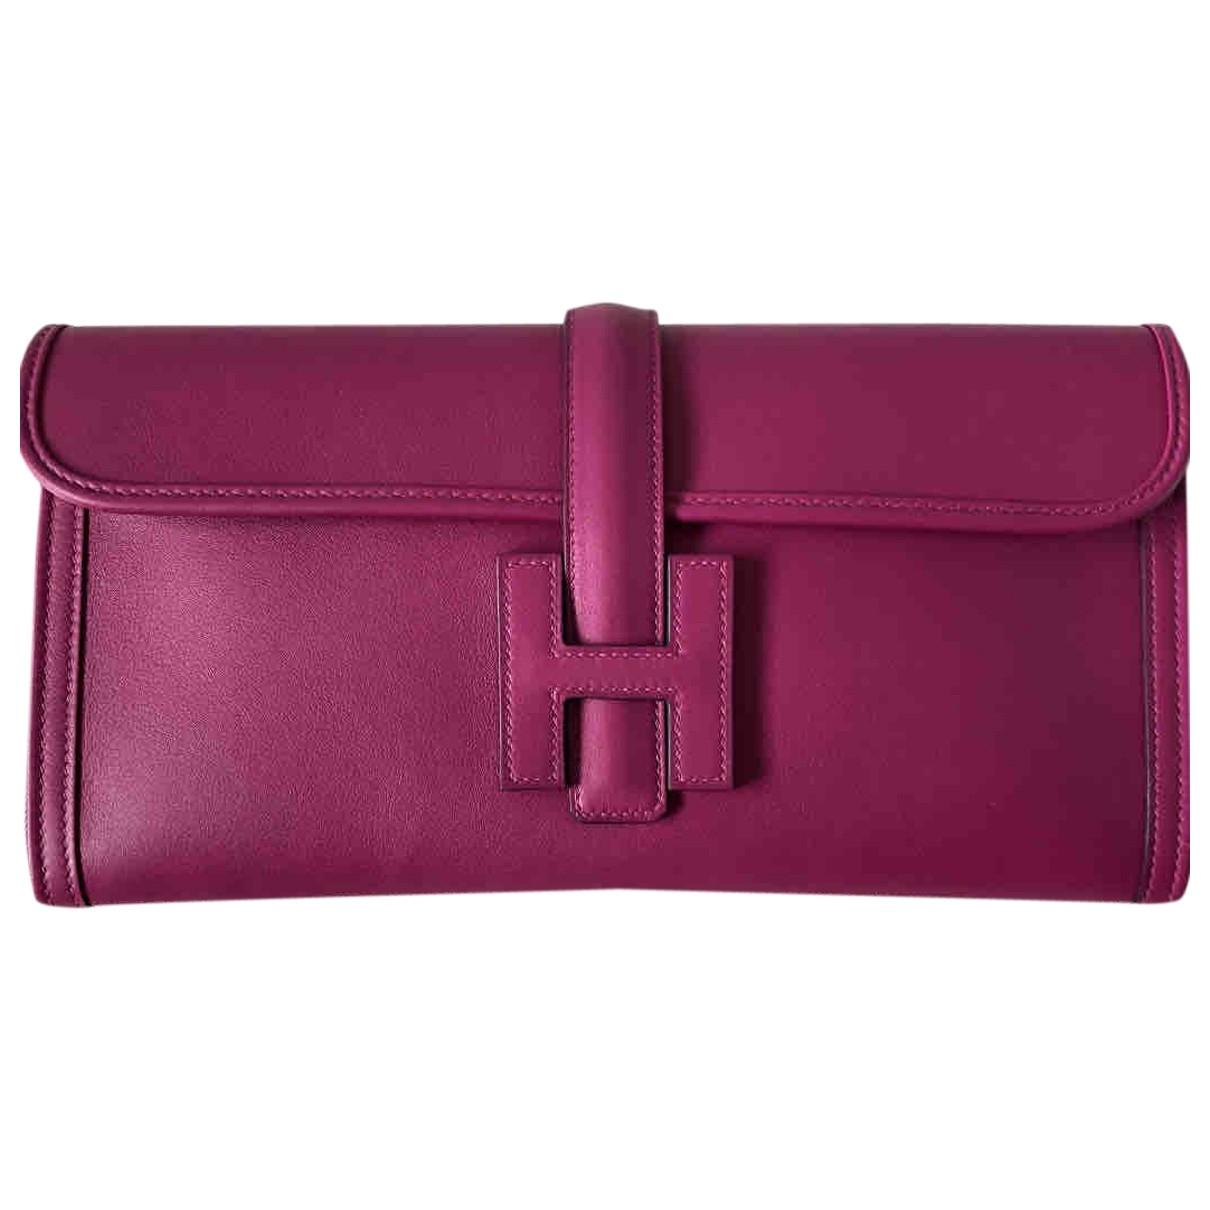 Hermès Jige Pink Leather Clutch bag for Women \N